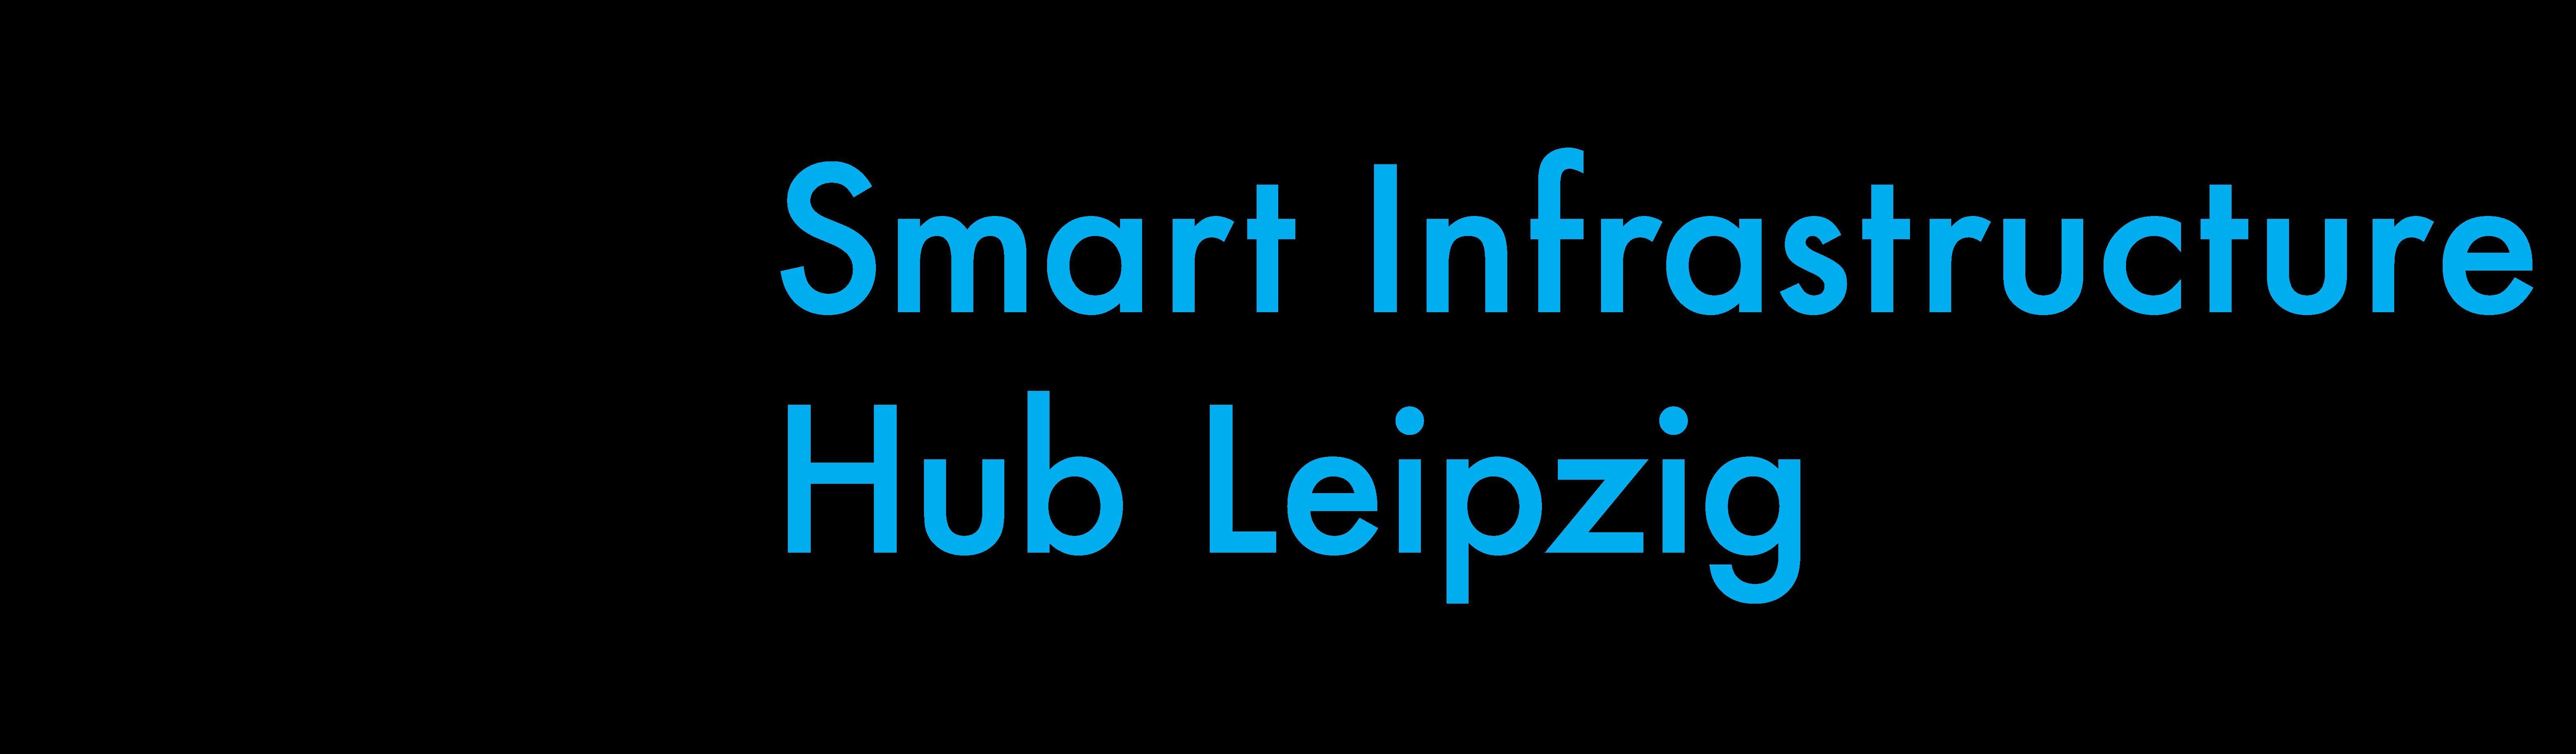 smart_infrastructure_hub_logo